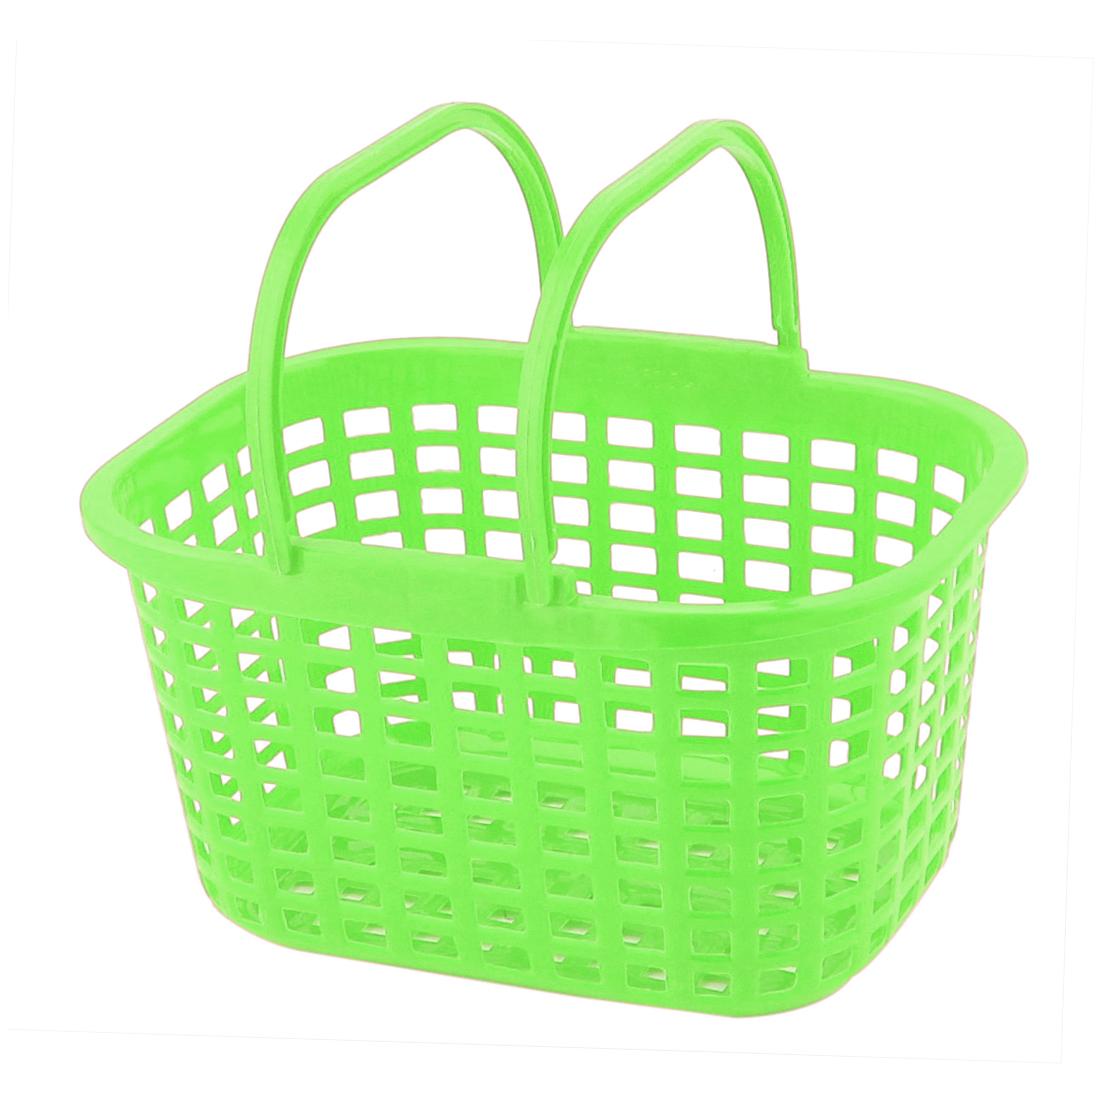 Household Washroom Bathroom Plastic Rectangle Design Portable Storage Basket Green